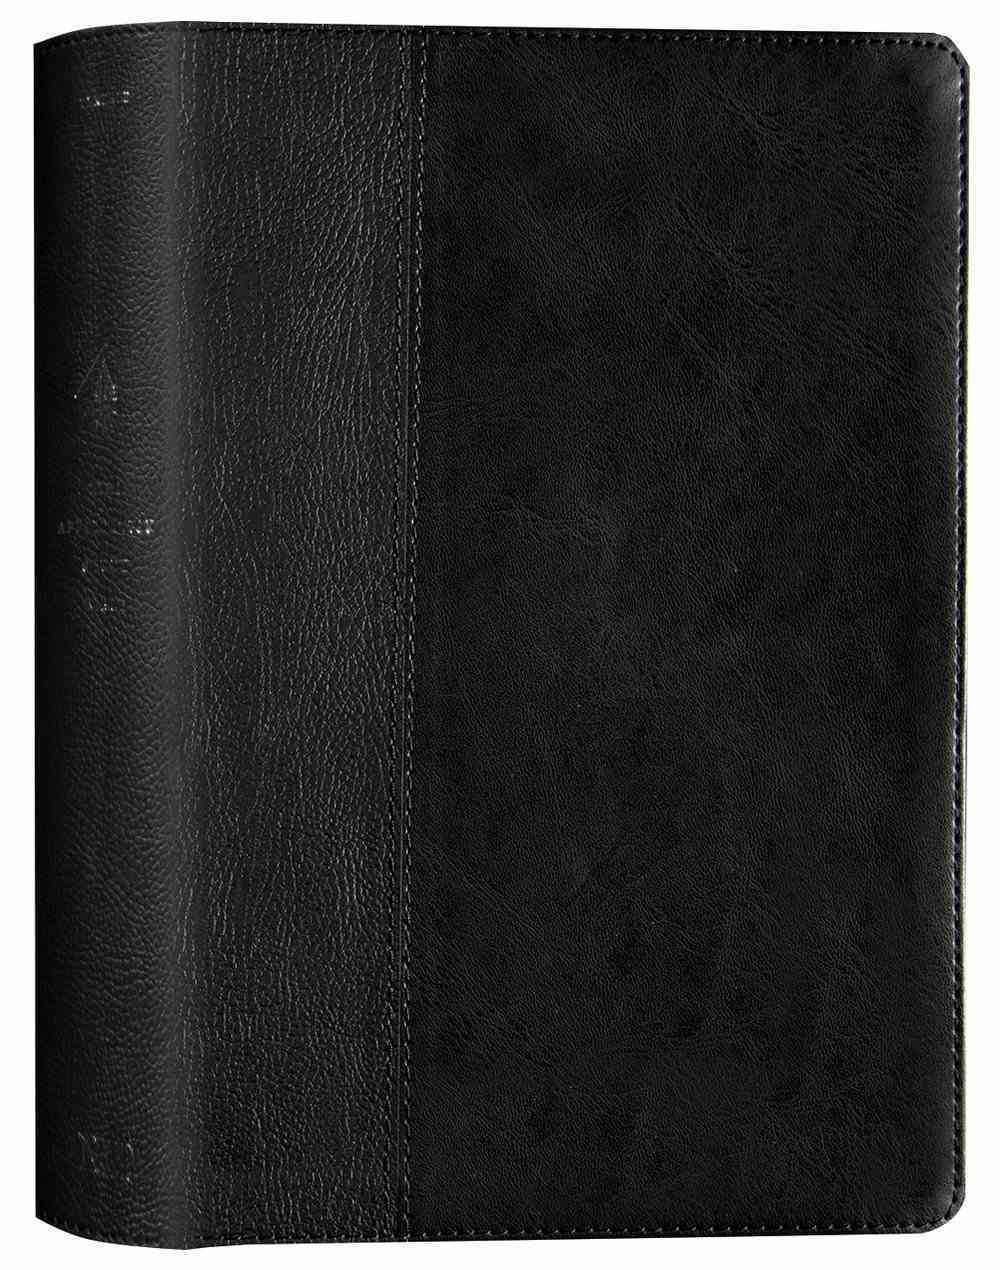 NLT Life Application Study Bible3 3rd Edition Black/Onyx (Black Letter Edition) Imitation Leather